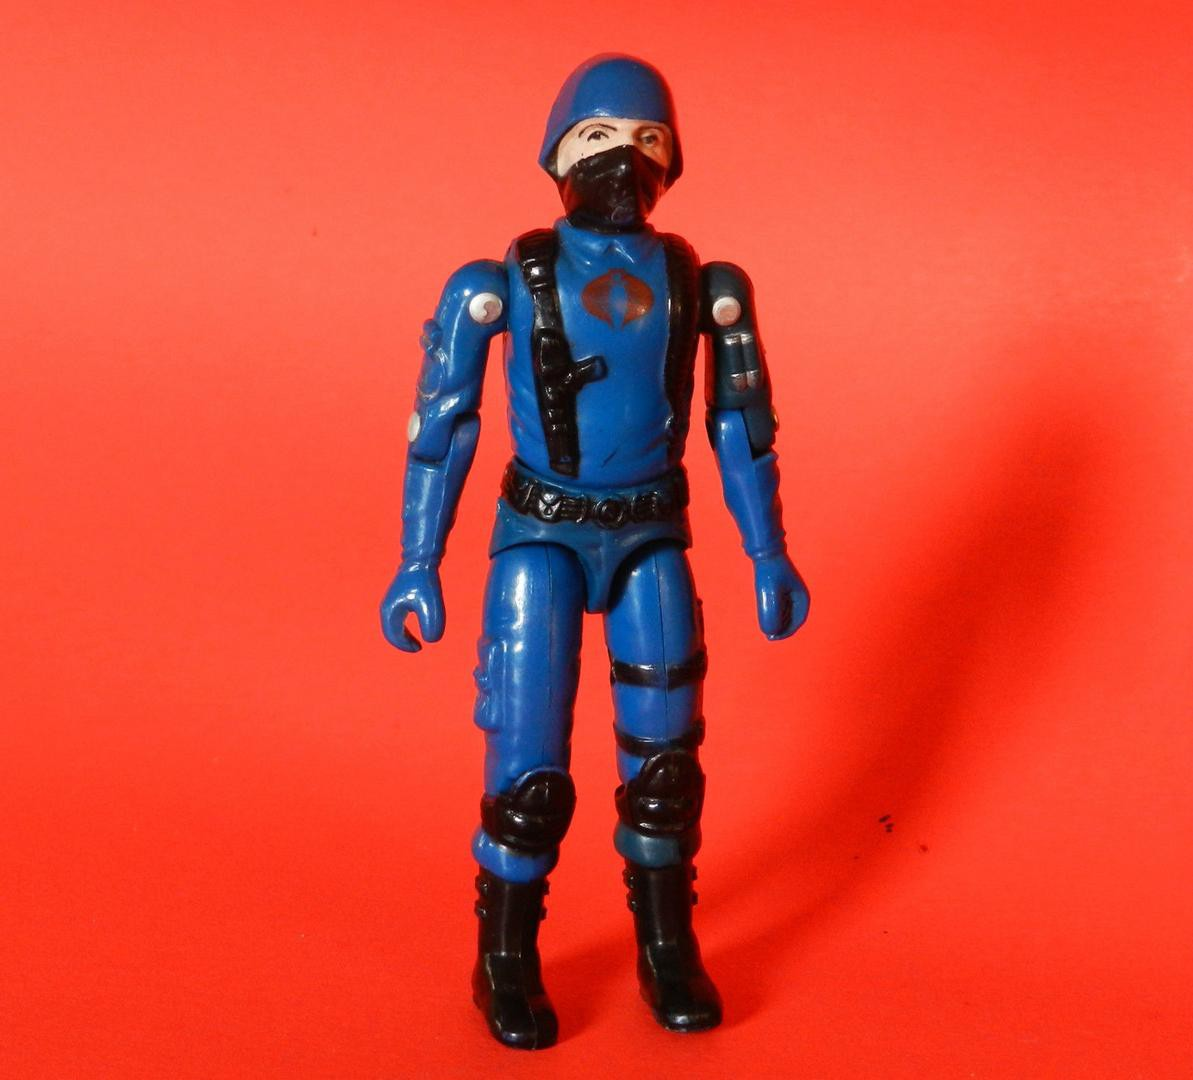 1990-gi-joe-cobra-soldier-rubiplas_1_0d39e1222aefd274b10ed3a24e802977.jpg